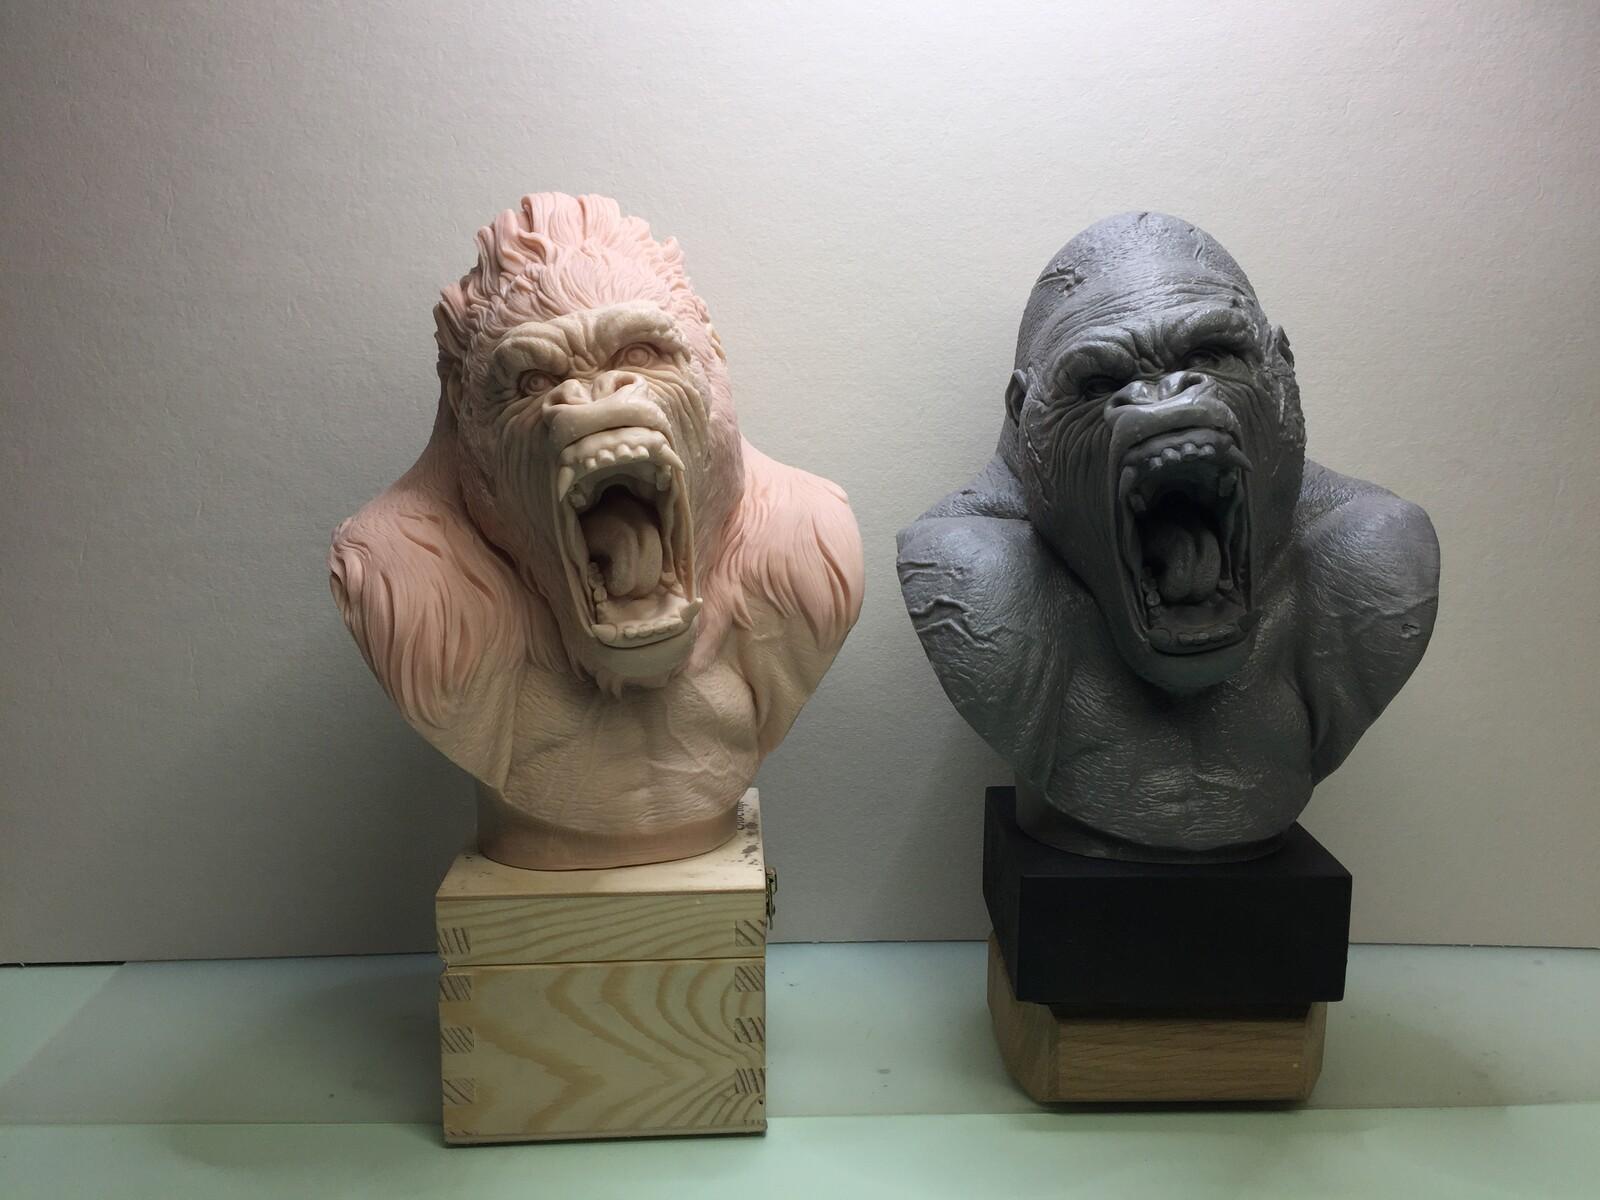 Gorillas busts